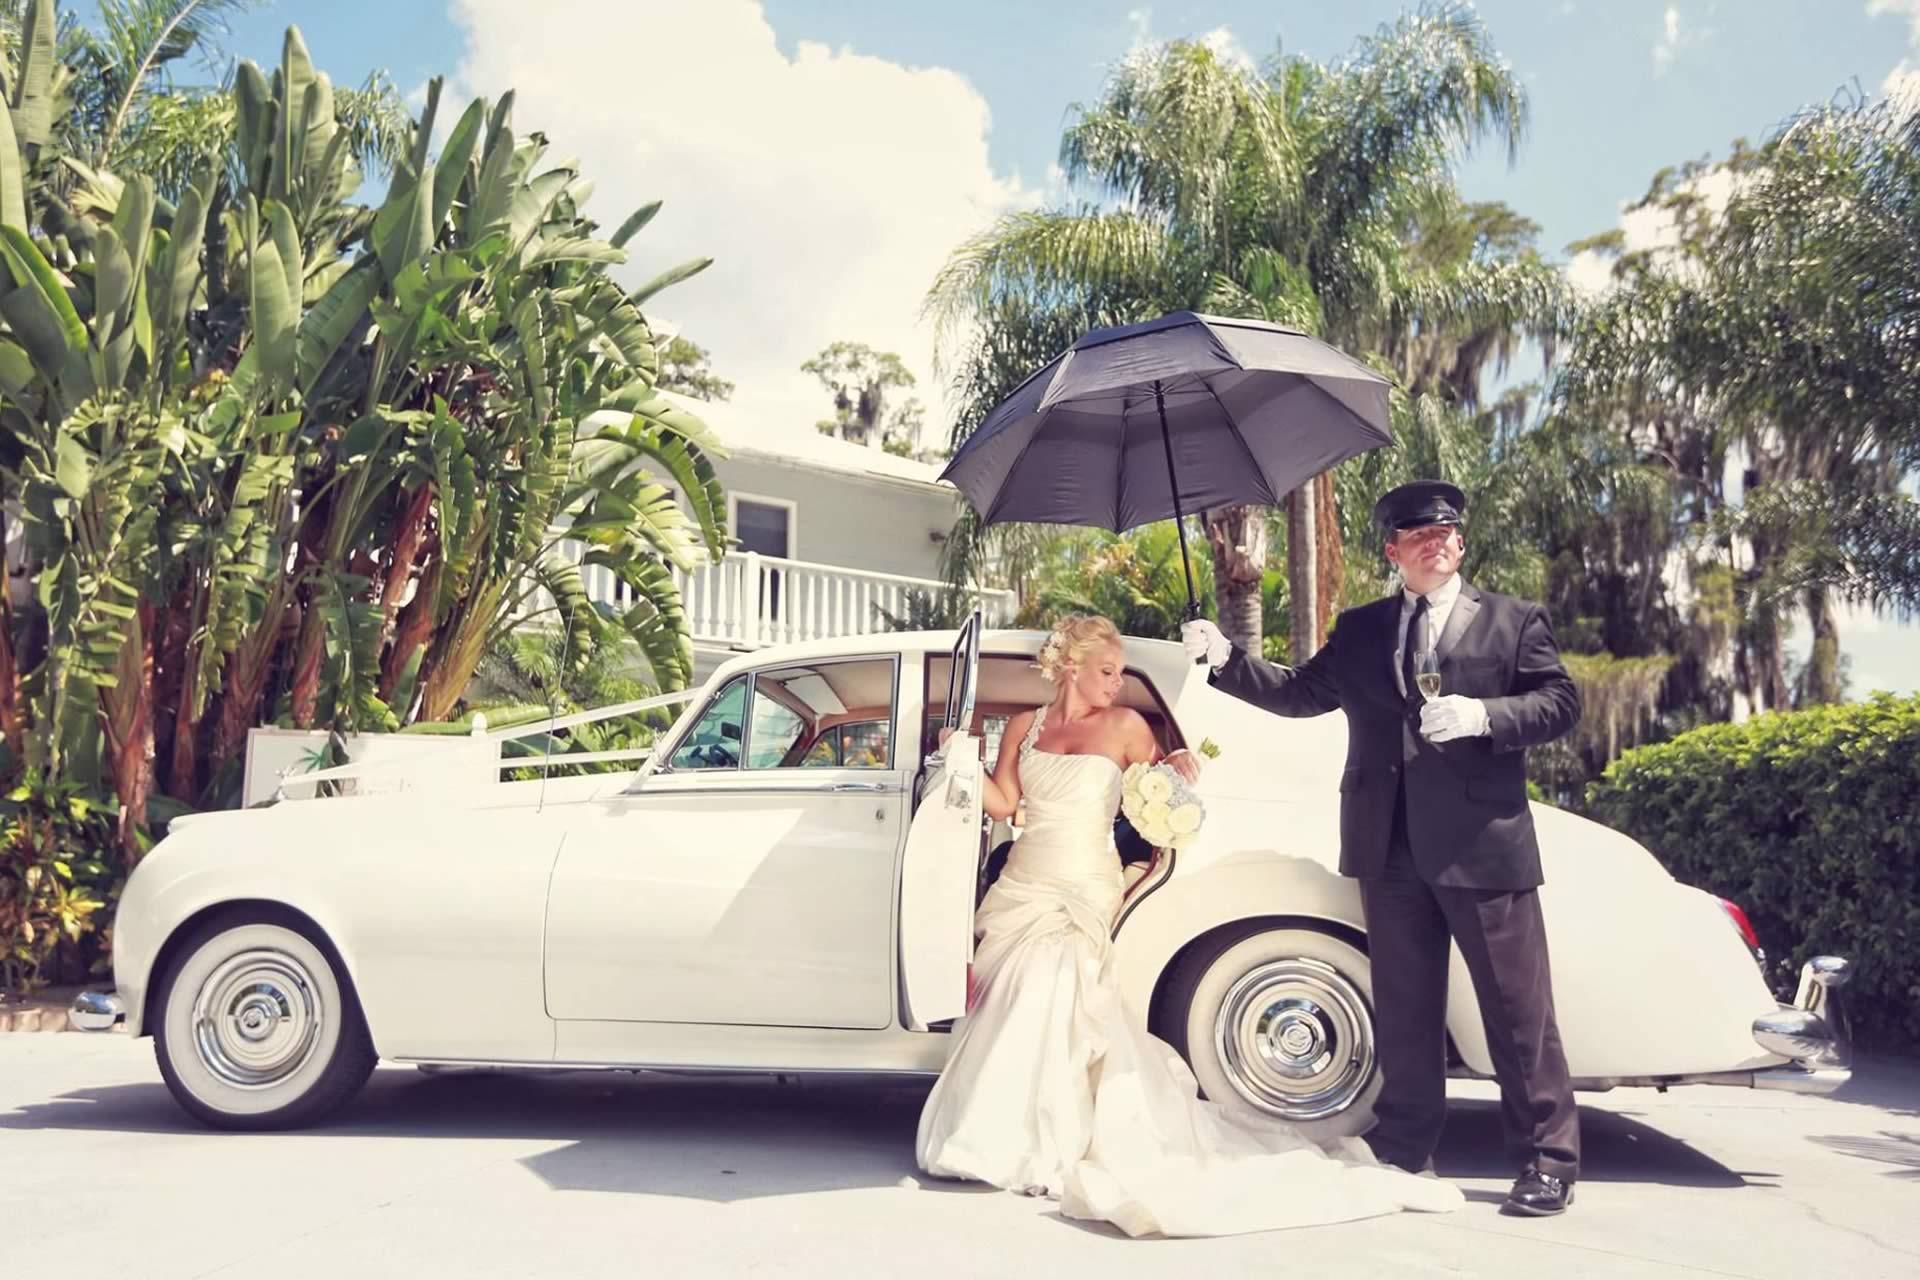 VIP Wedding Transportation - Image provided by: CastaldoStudio.com